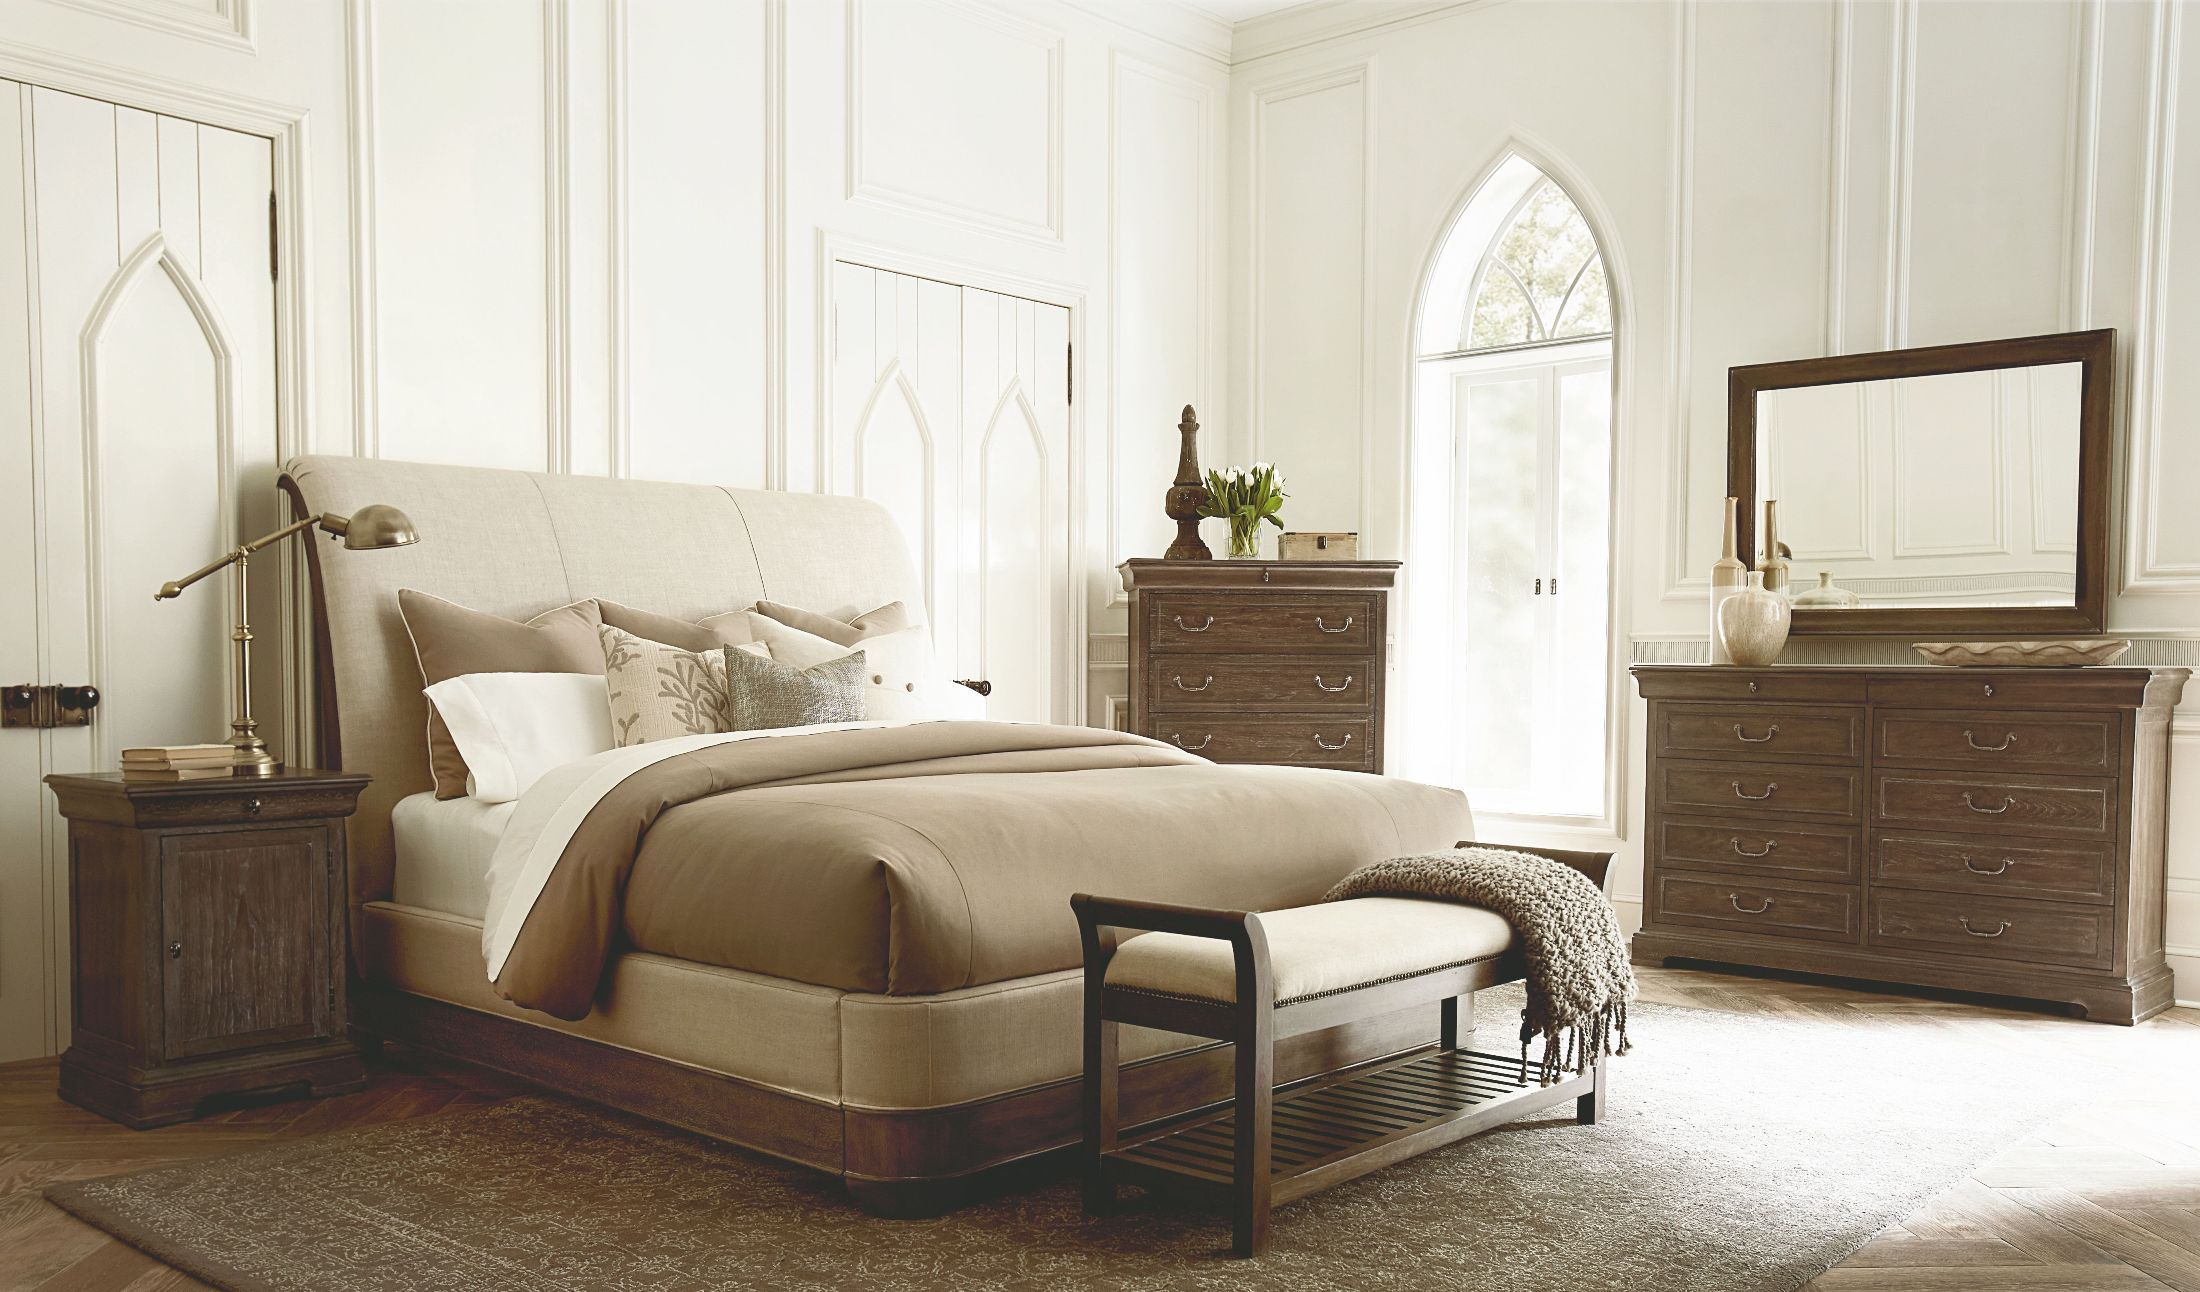 Terrific St Germain Distressed Foxtail Upholstered Platform Sleigh Bedroom Set Home Interior And Landscaping Ferensignezvosmurscom